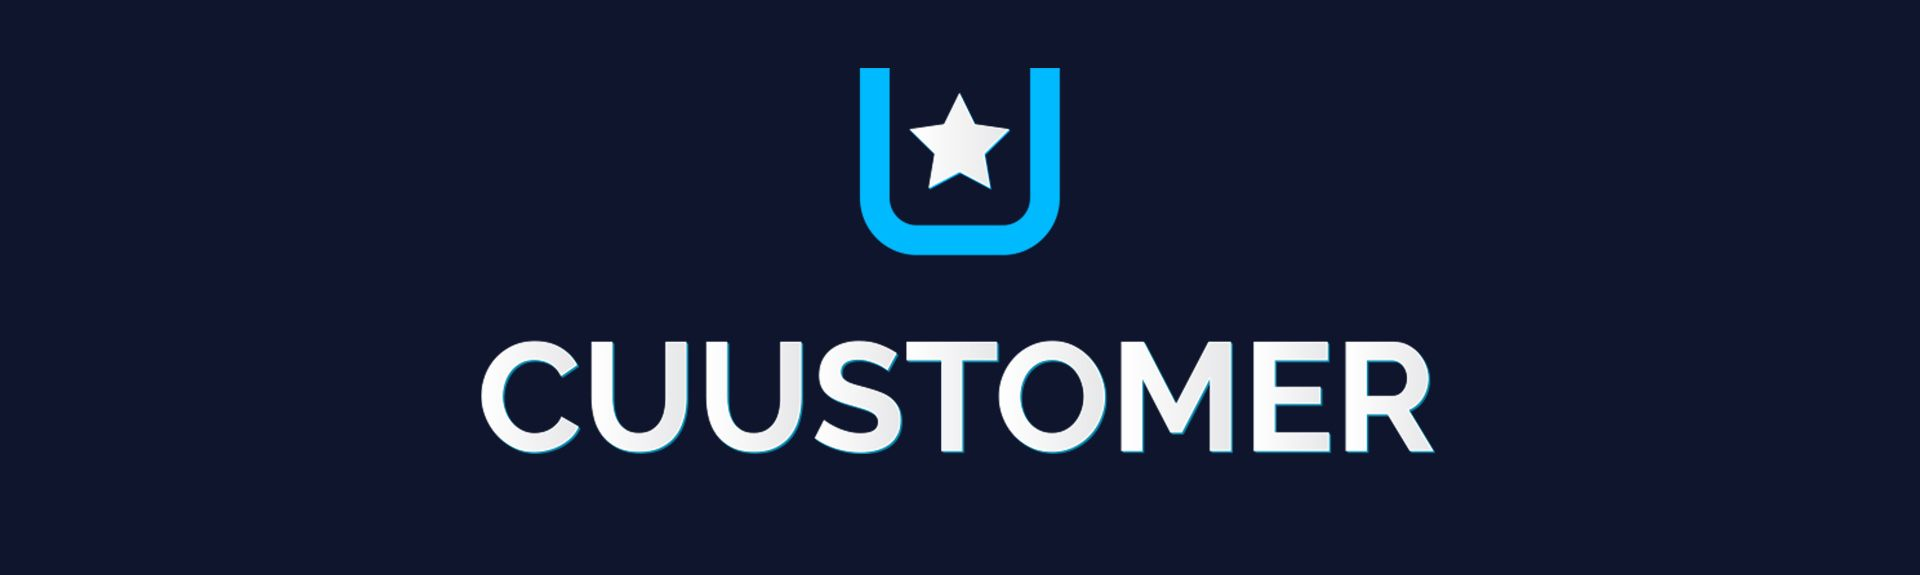 Cuustomer : la start-up belge lance le « tripadvisor » des fournisseurs B2B